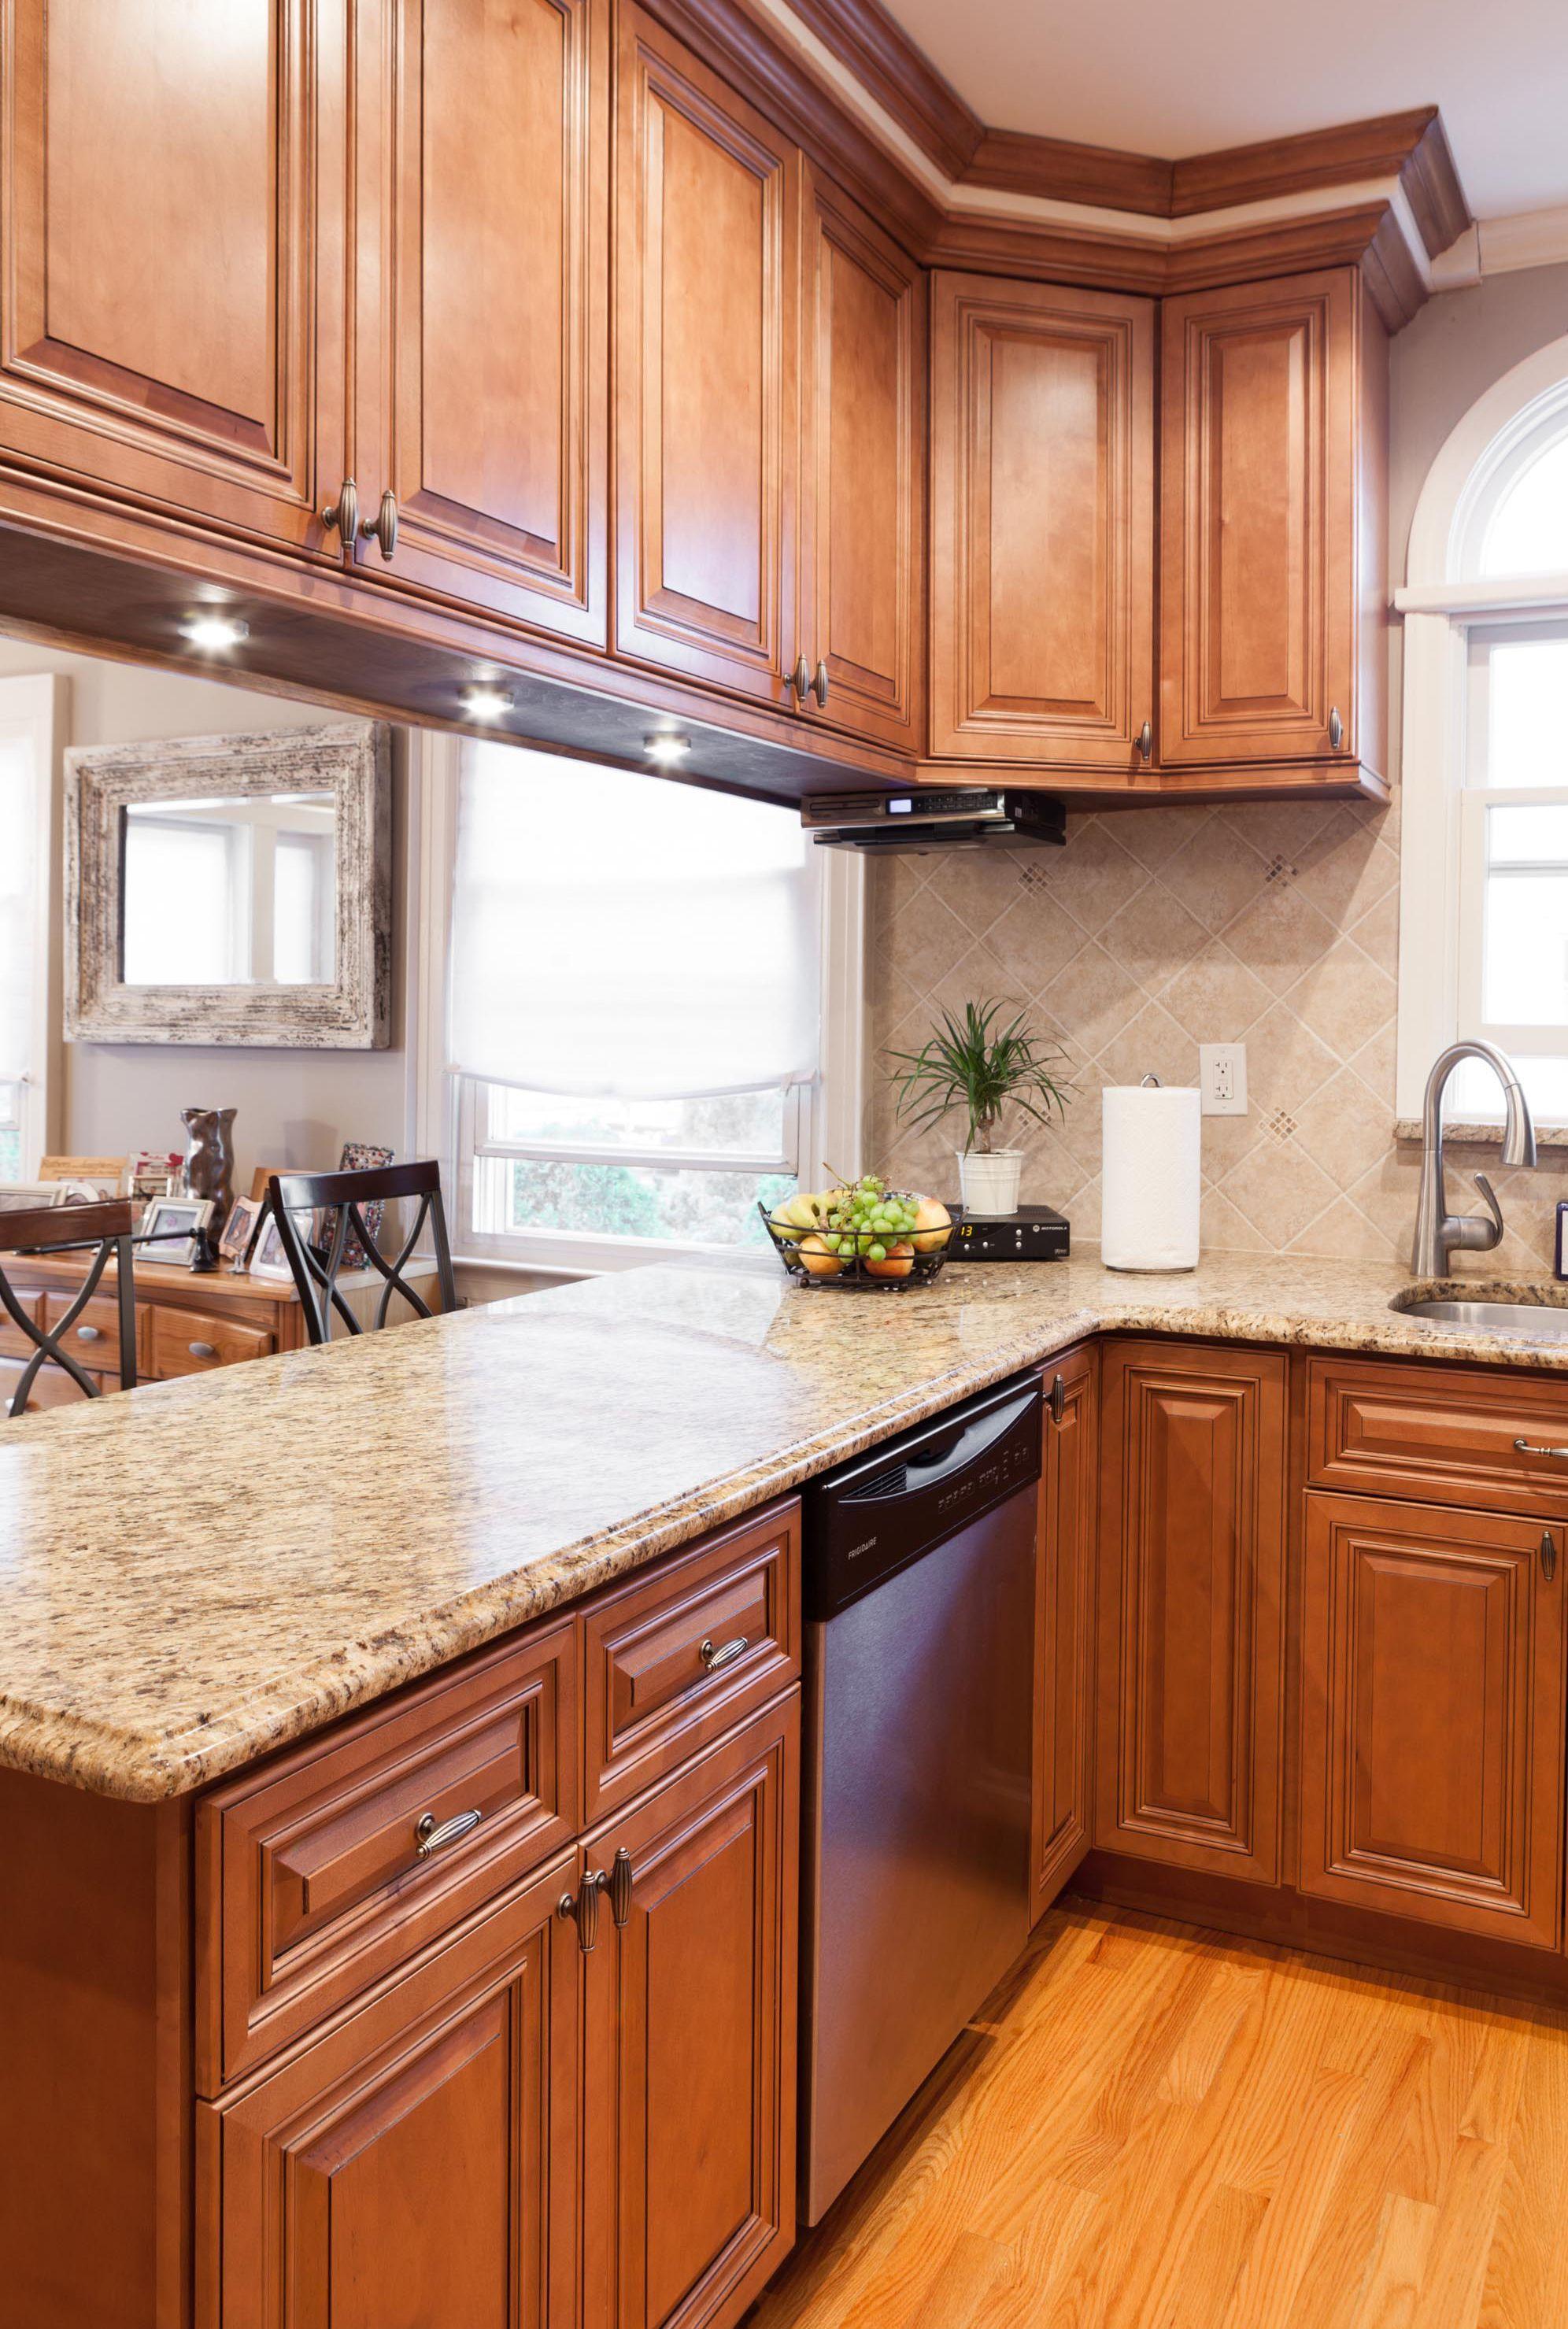 13 Kitchen Backsplash Ideas With Maple Cabinets Images Kitchen Cabinet Design Maple Kitchen Cabinets Granite Countertops Kitchen